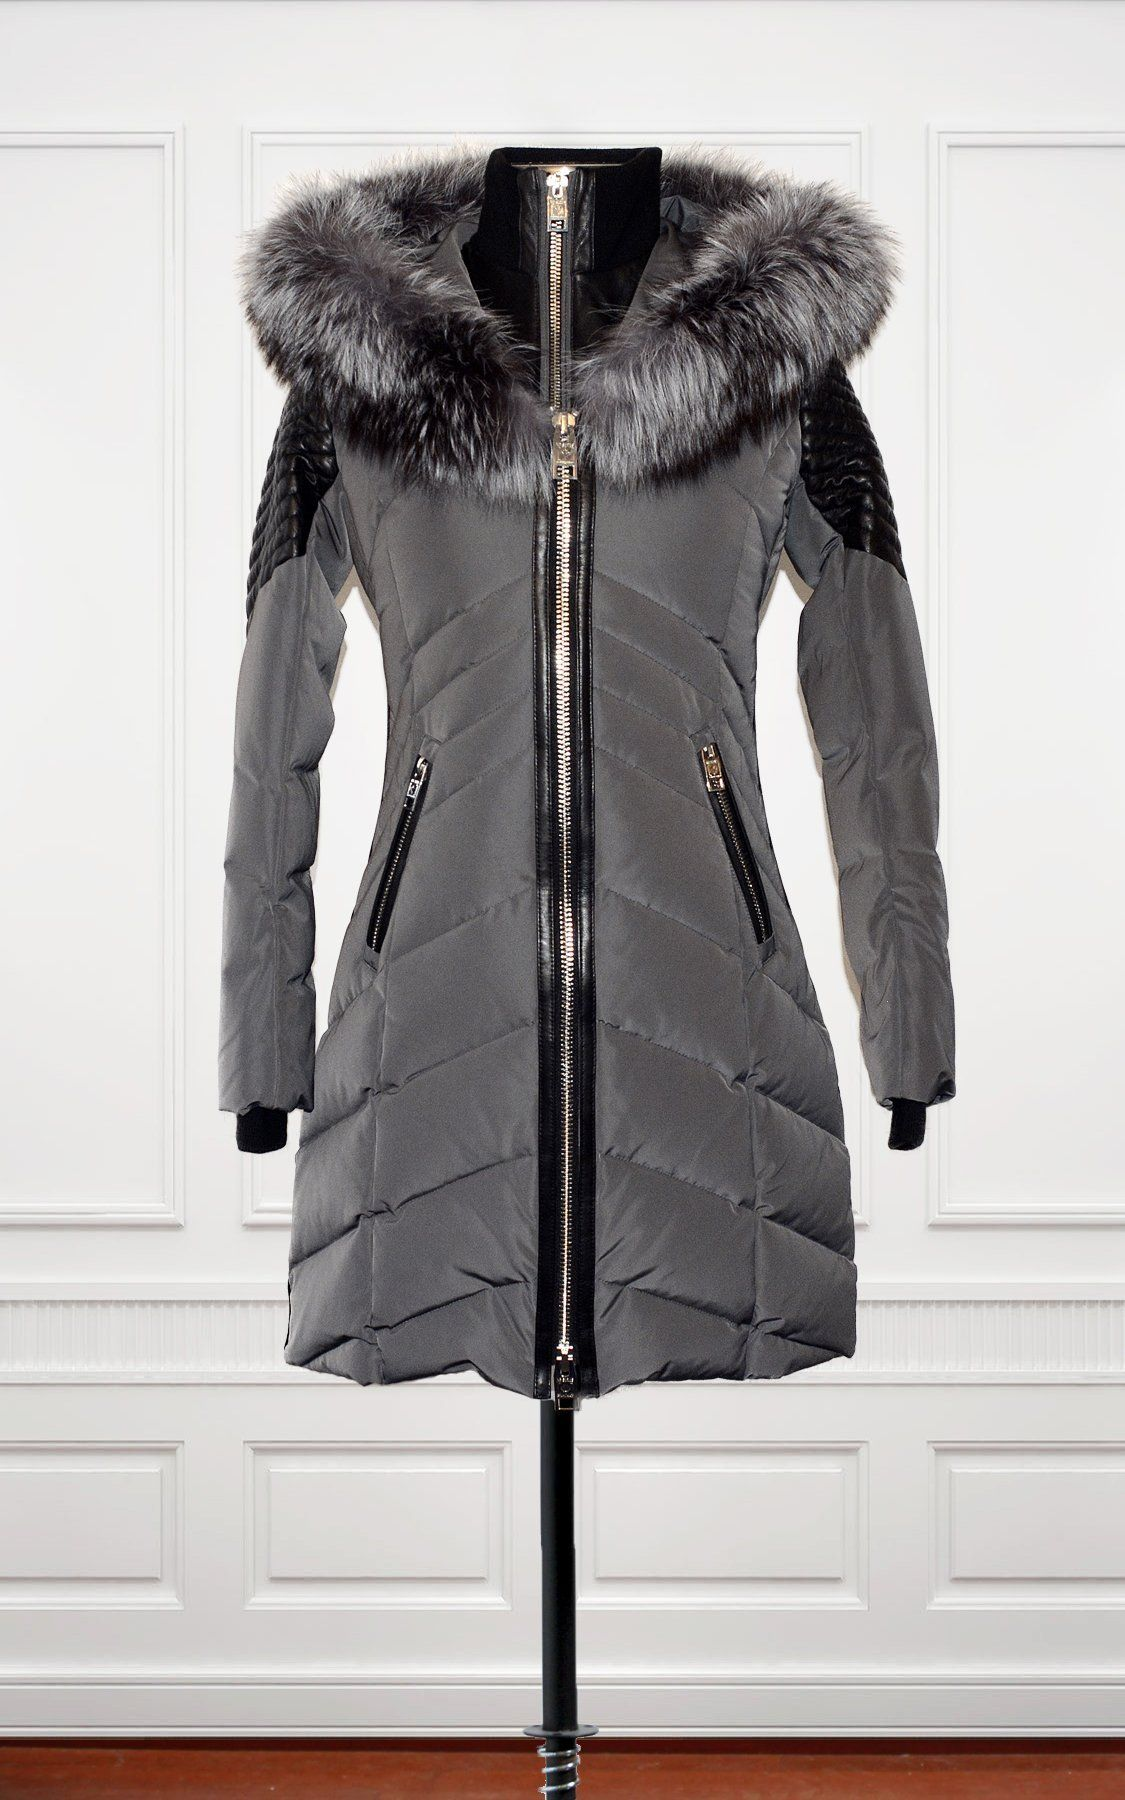 Nicole Benisti Down Winter Coat Cortina Jk11010 Down Winter Coats Winter Coat Coat [ 1800 x 1125 Pixel ]